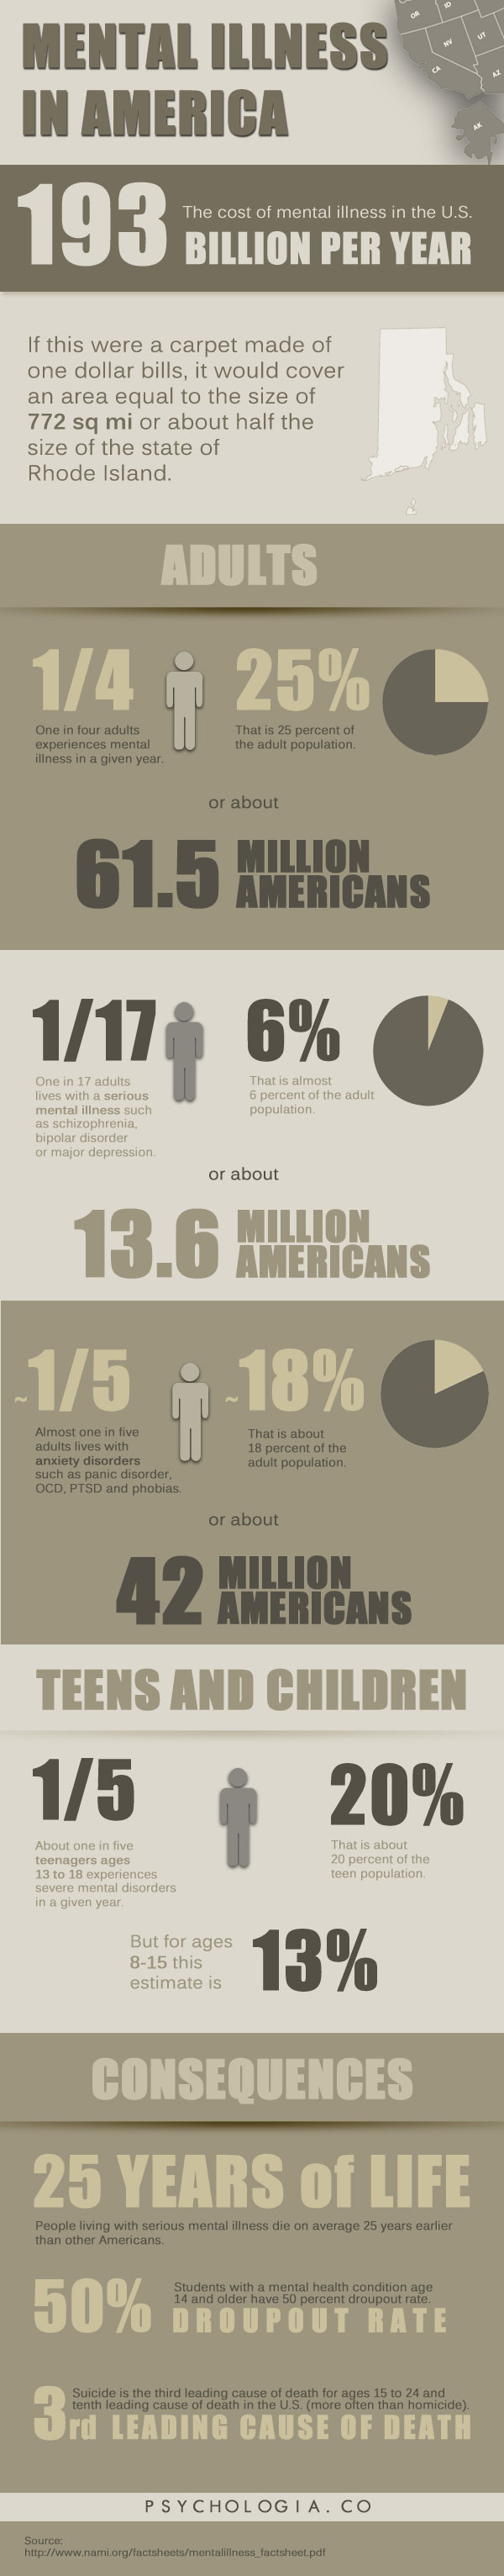 Mental Illness in the U.S. Statistics (Infographic)